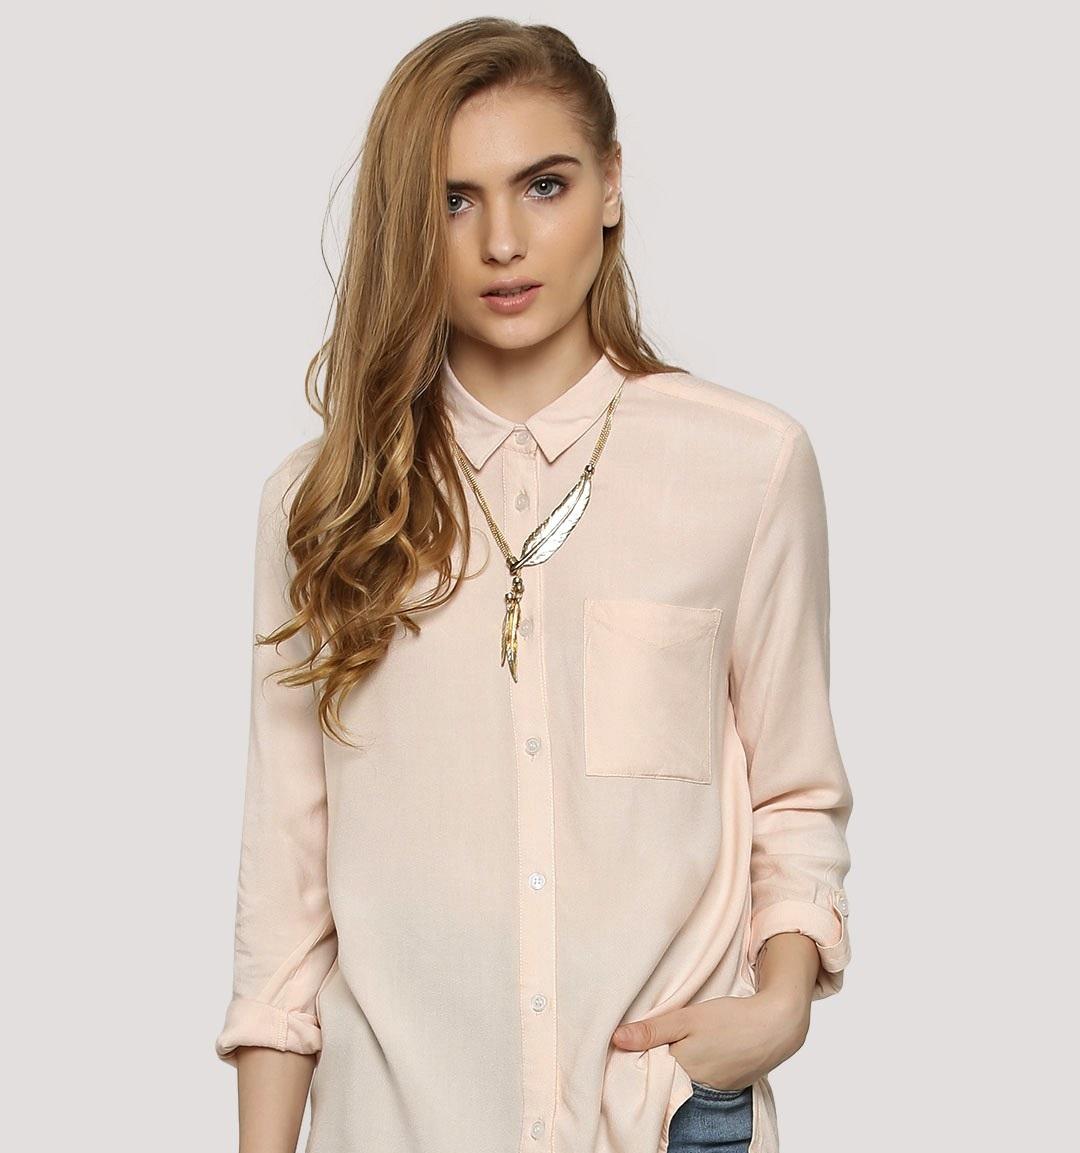 koovs RTW Collar shirt for winters